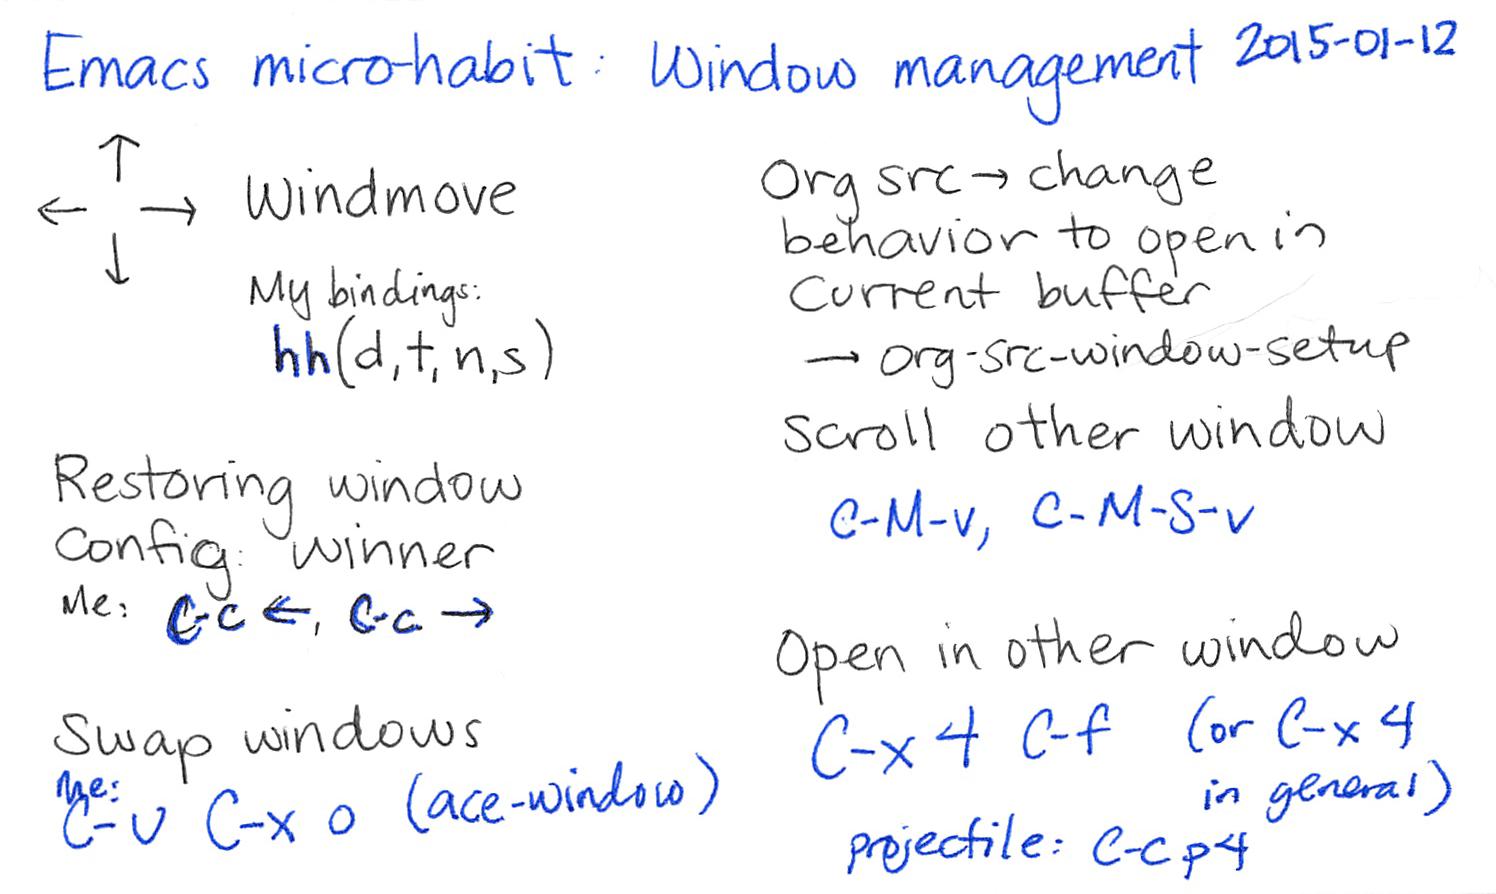 Windows Live Writer And Blogging 7 Profesional Win Pro Coa Bonus Stiker Logo Dan Installer 2015 01 12 Emacs Microhabit Window Management Index Card